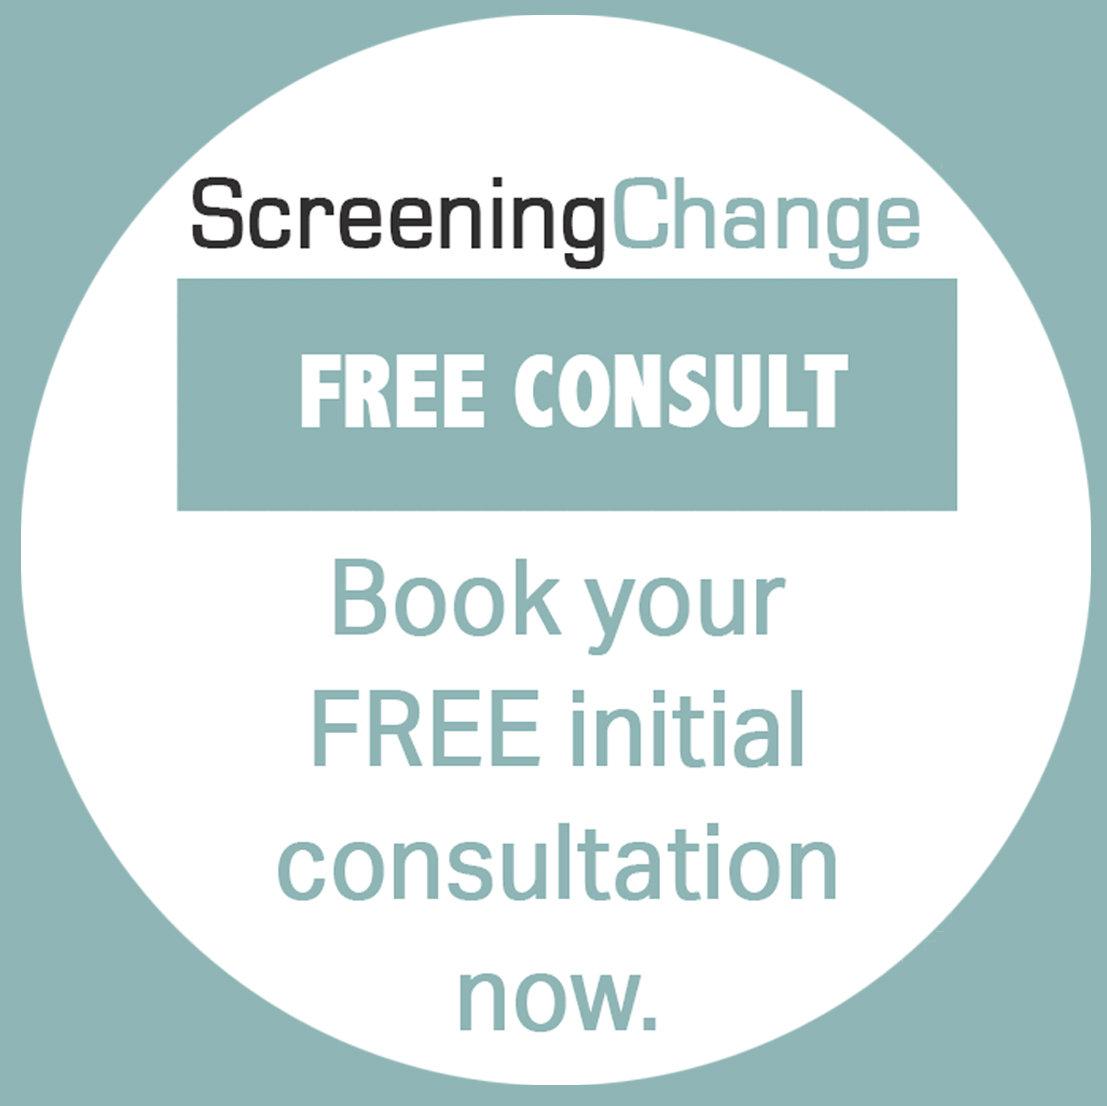 Initial FREE Consult